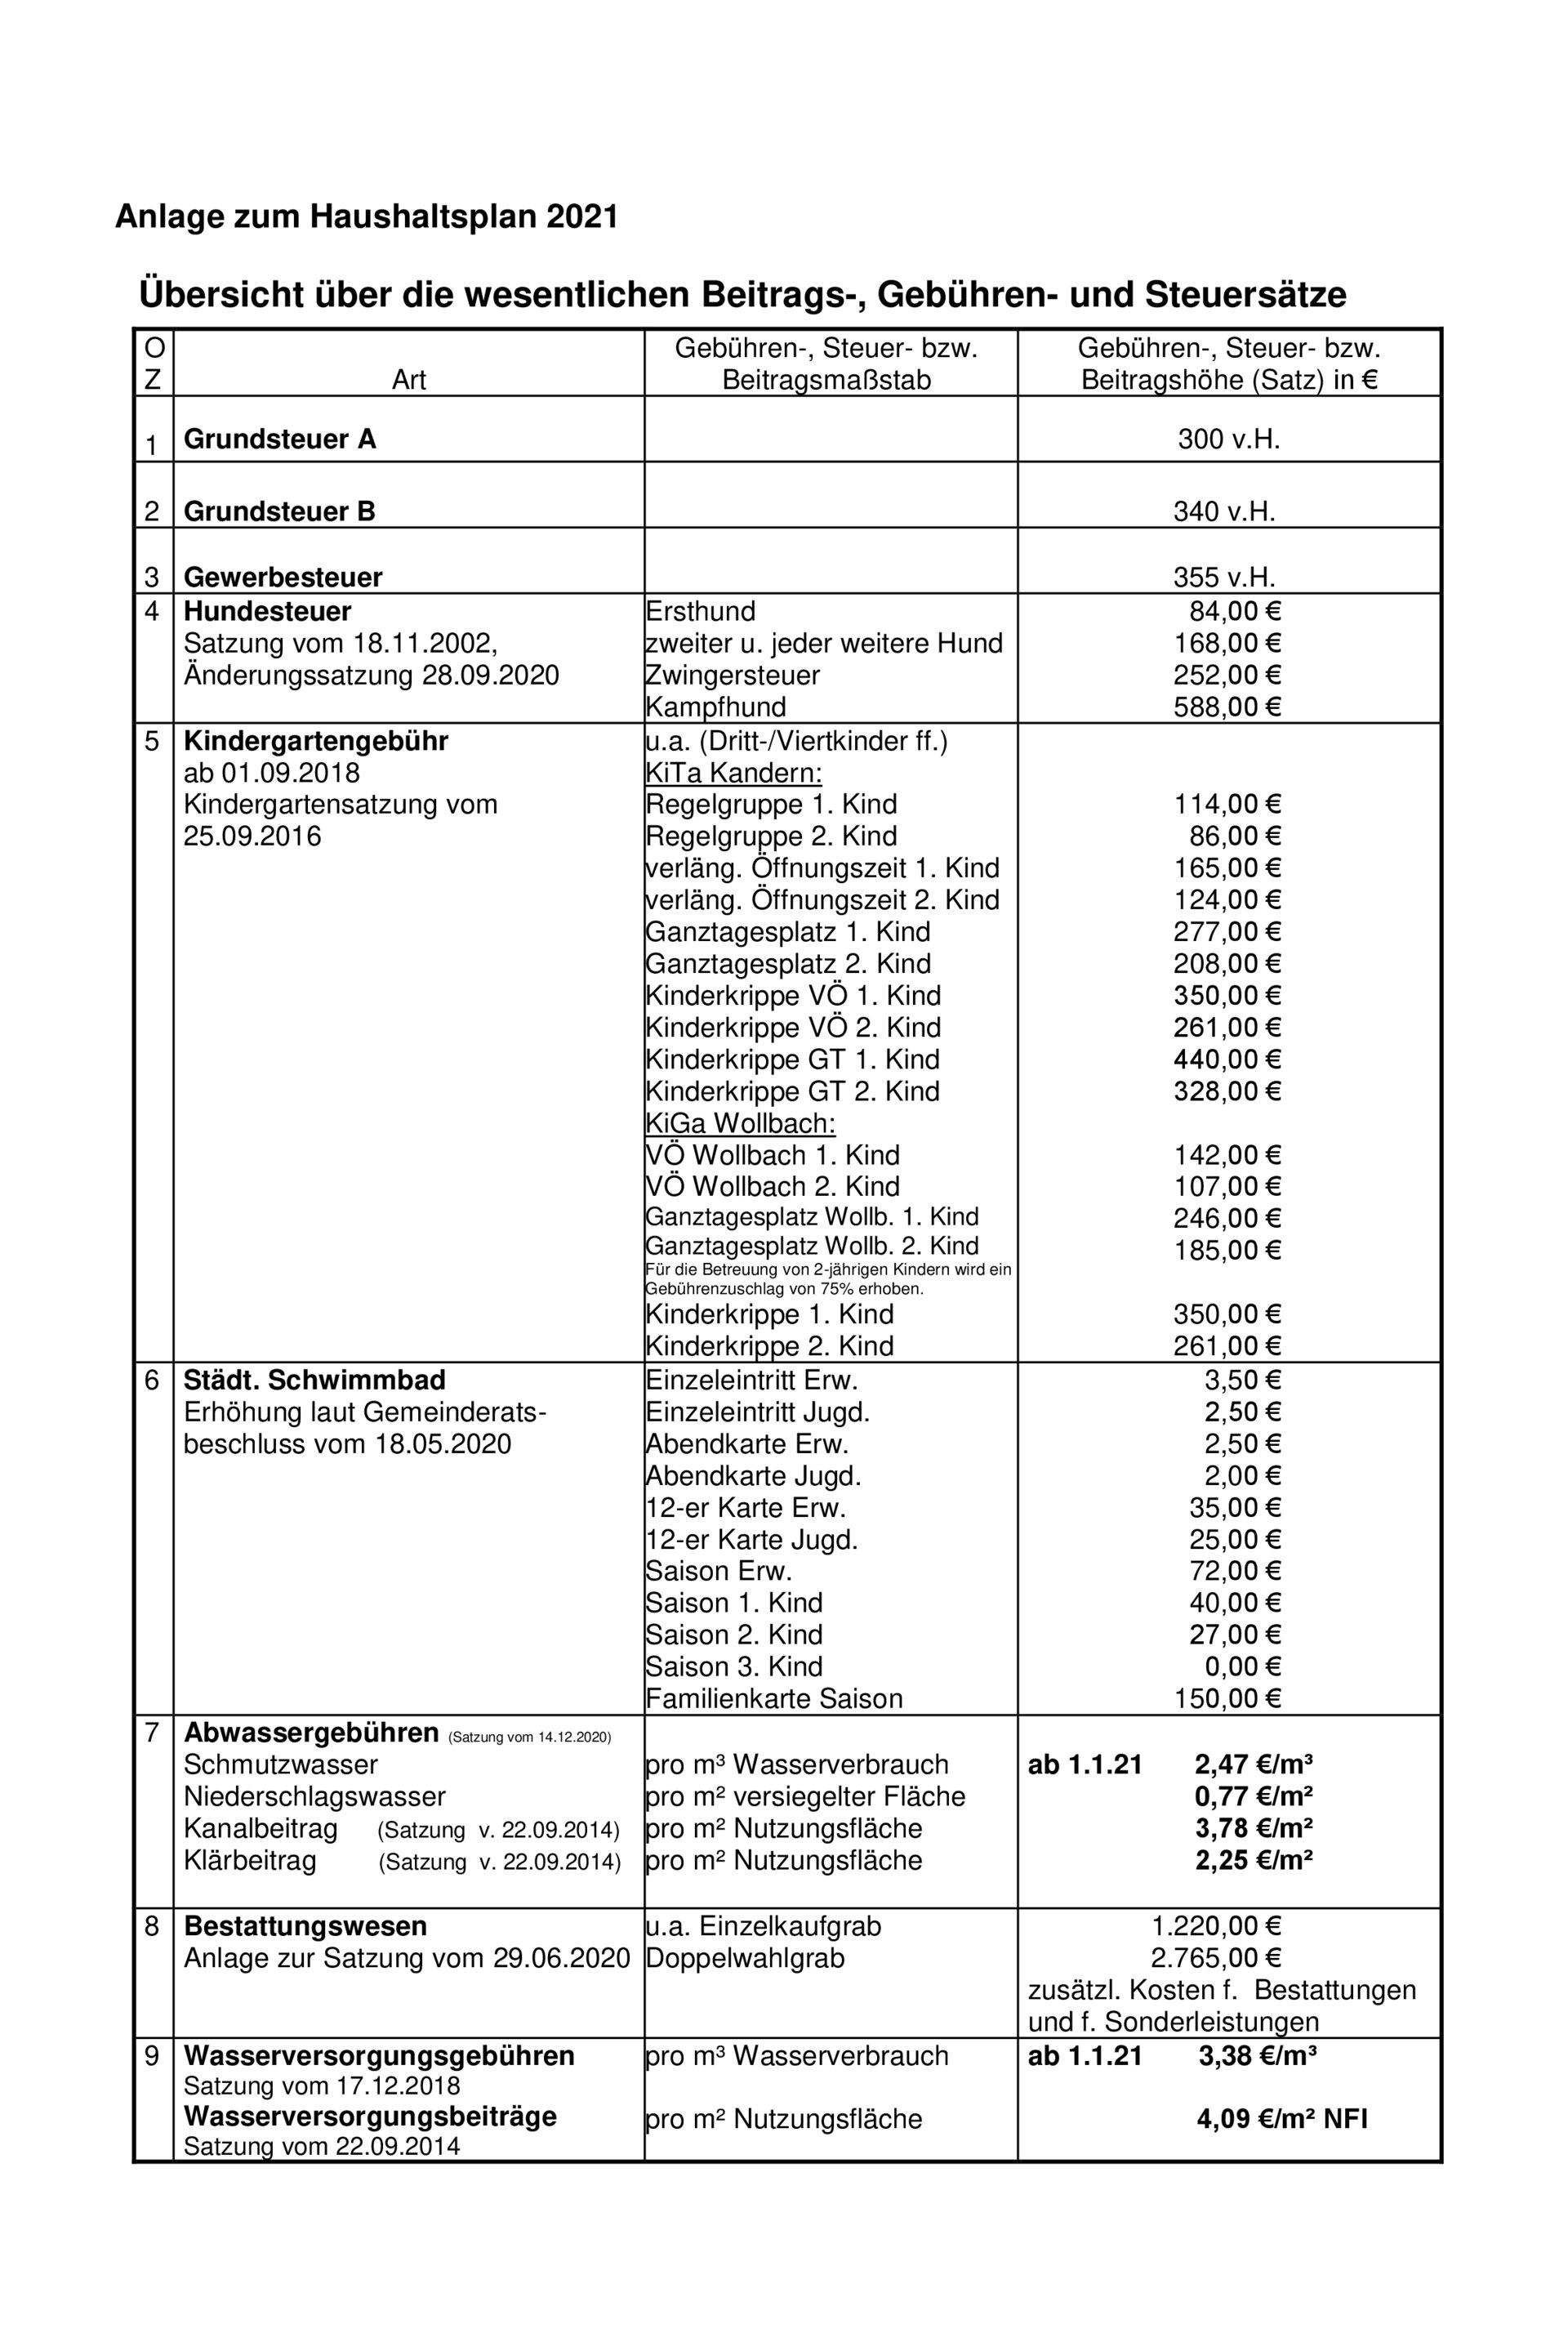 Beitrags-Gebühren-Steuersätze2021